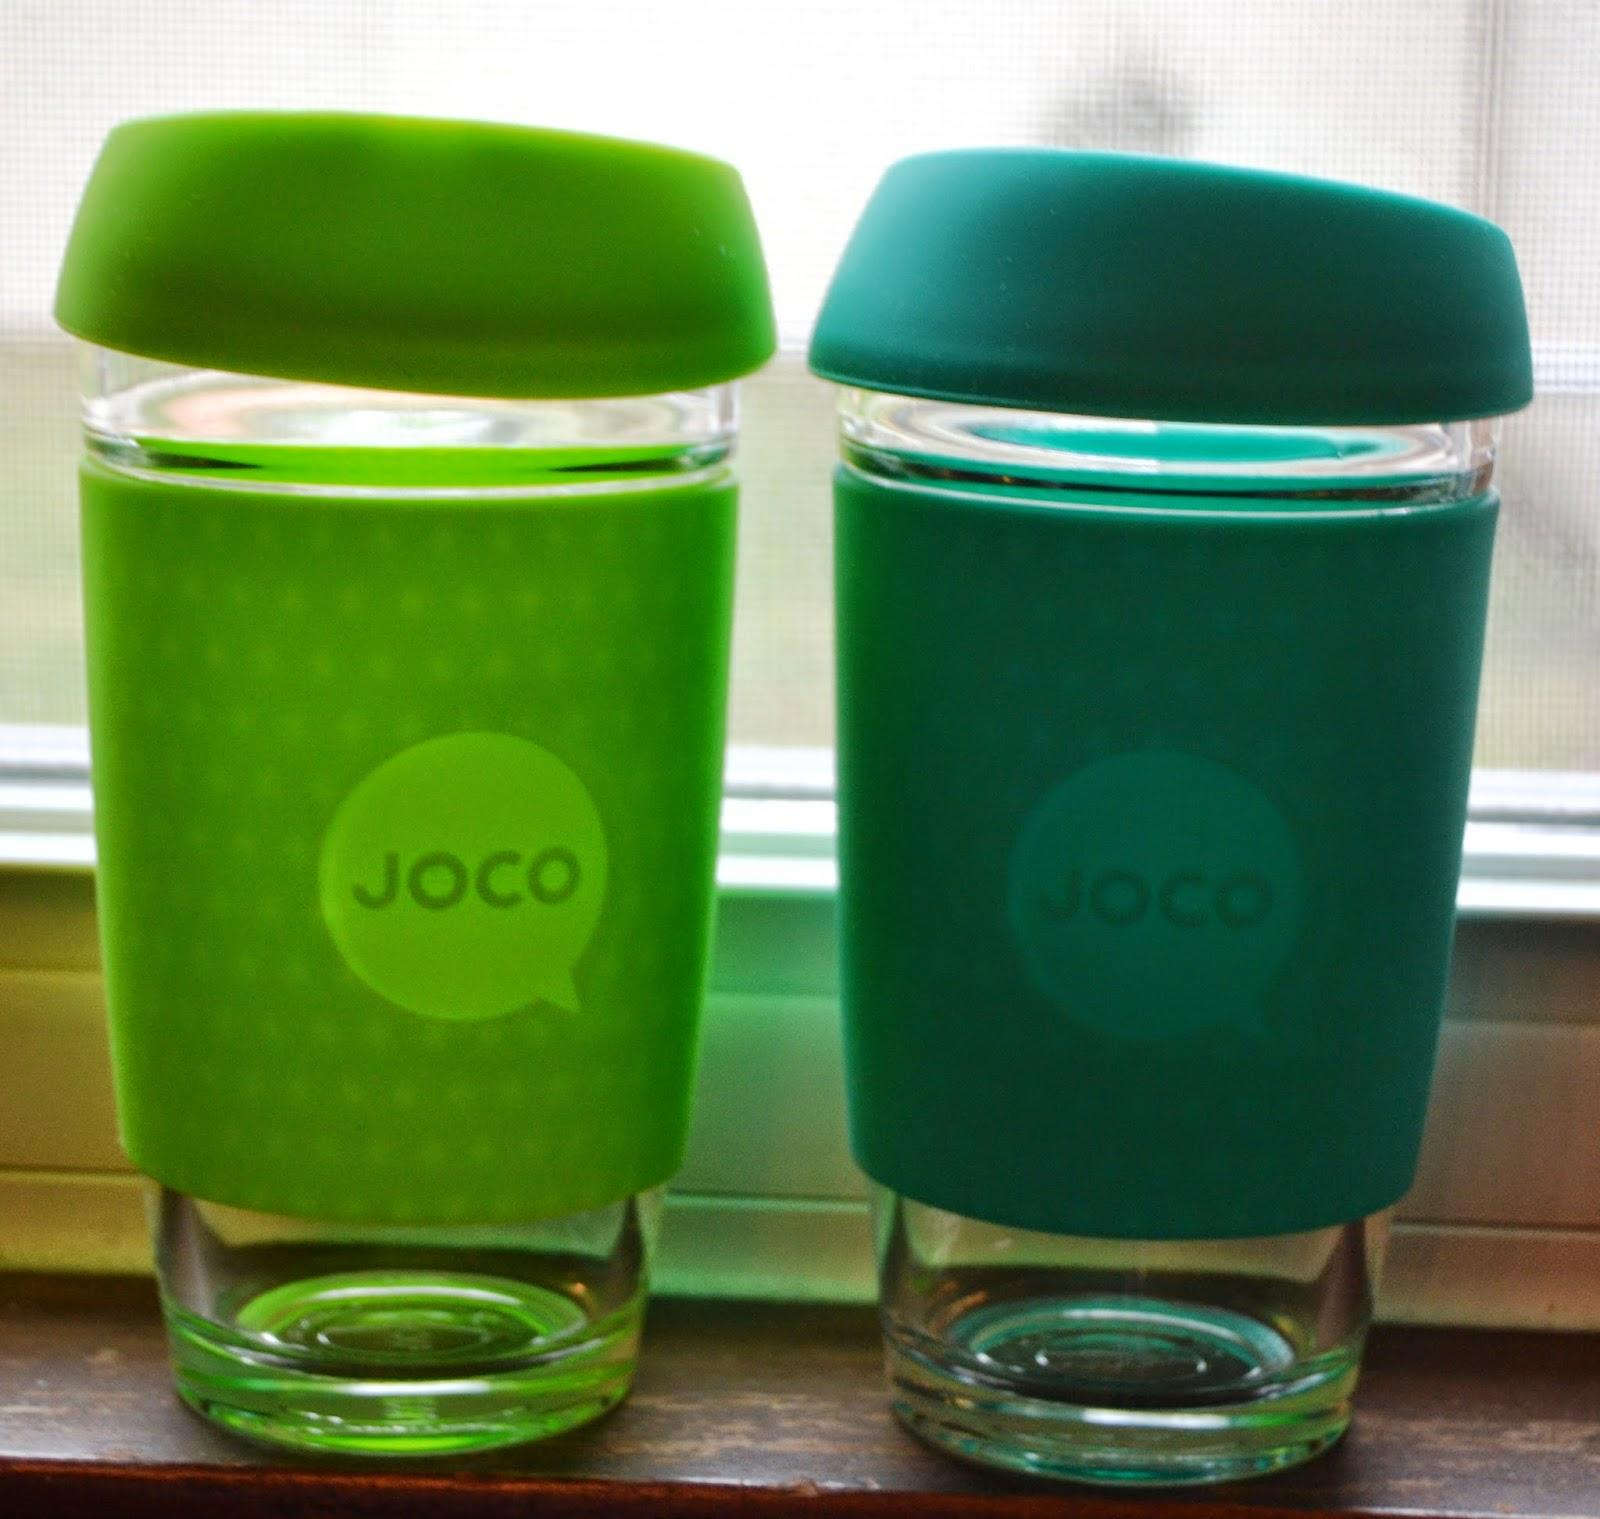 JOCO Cups